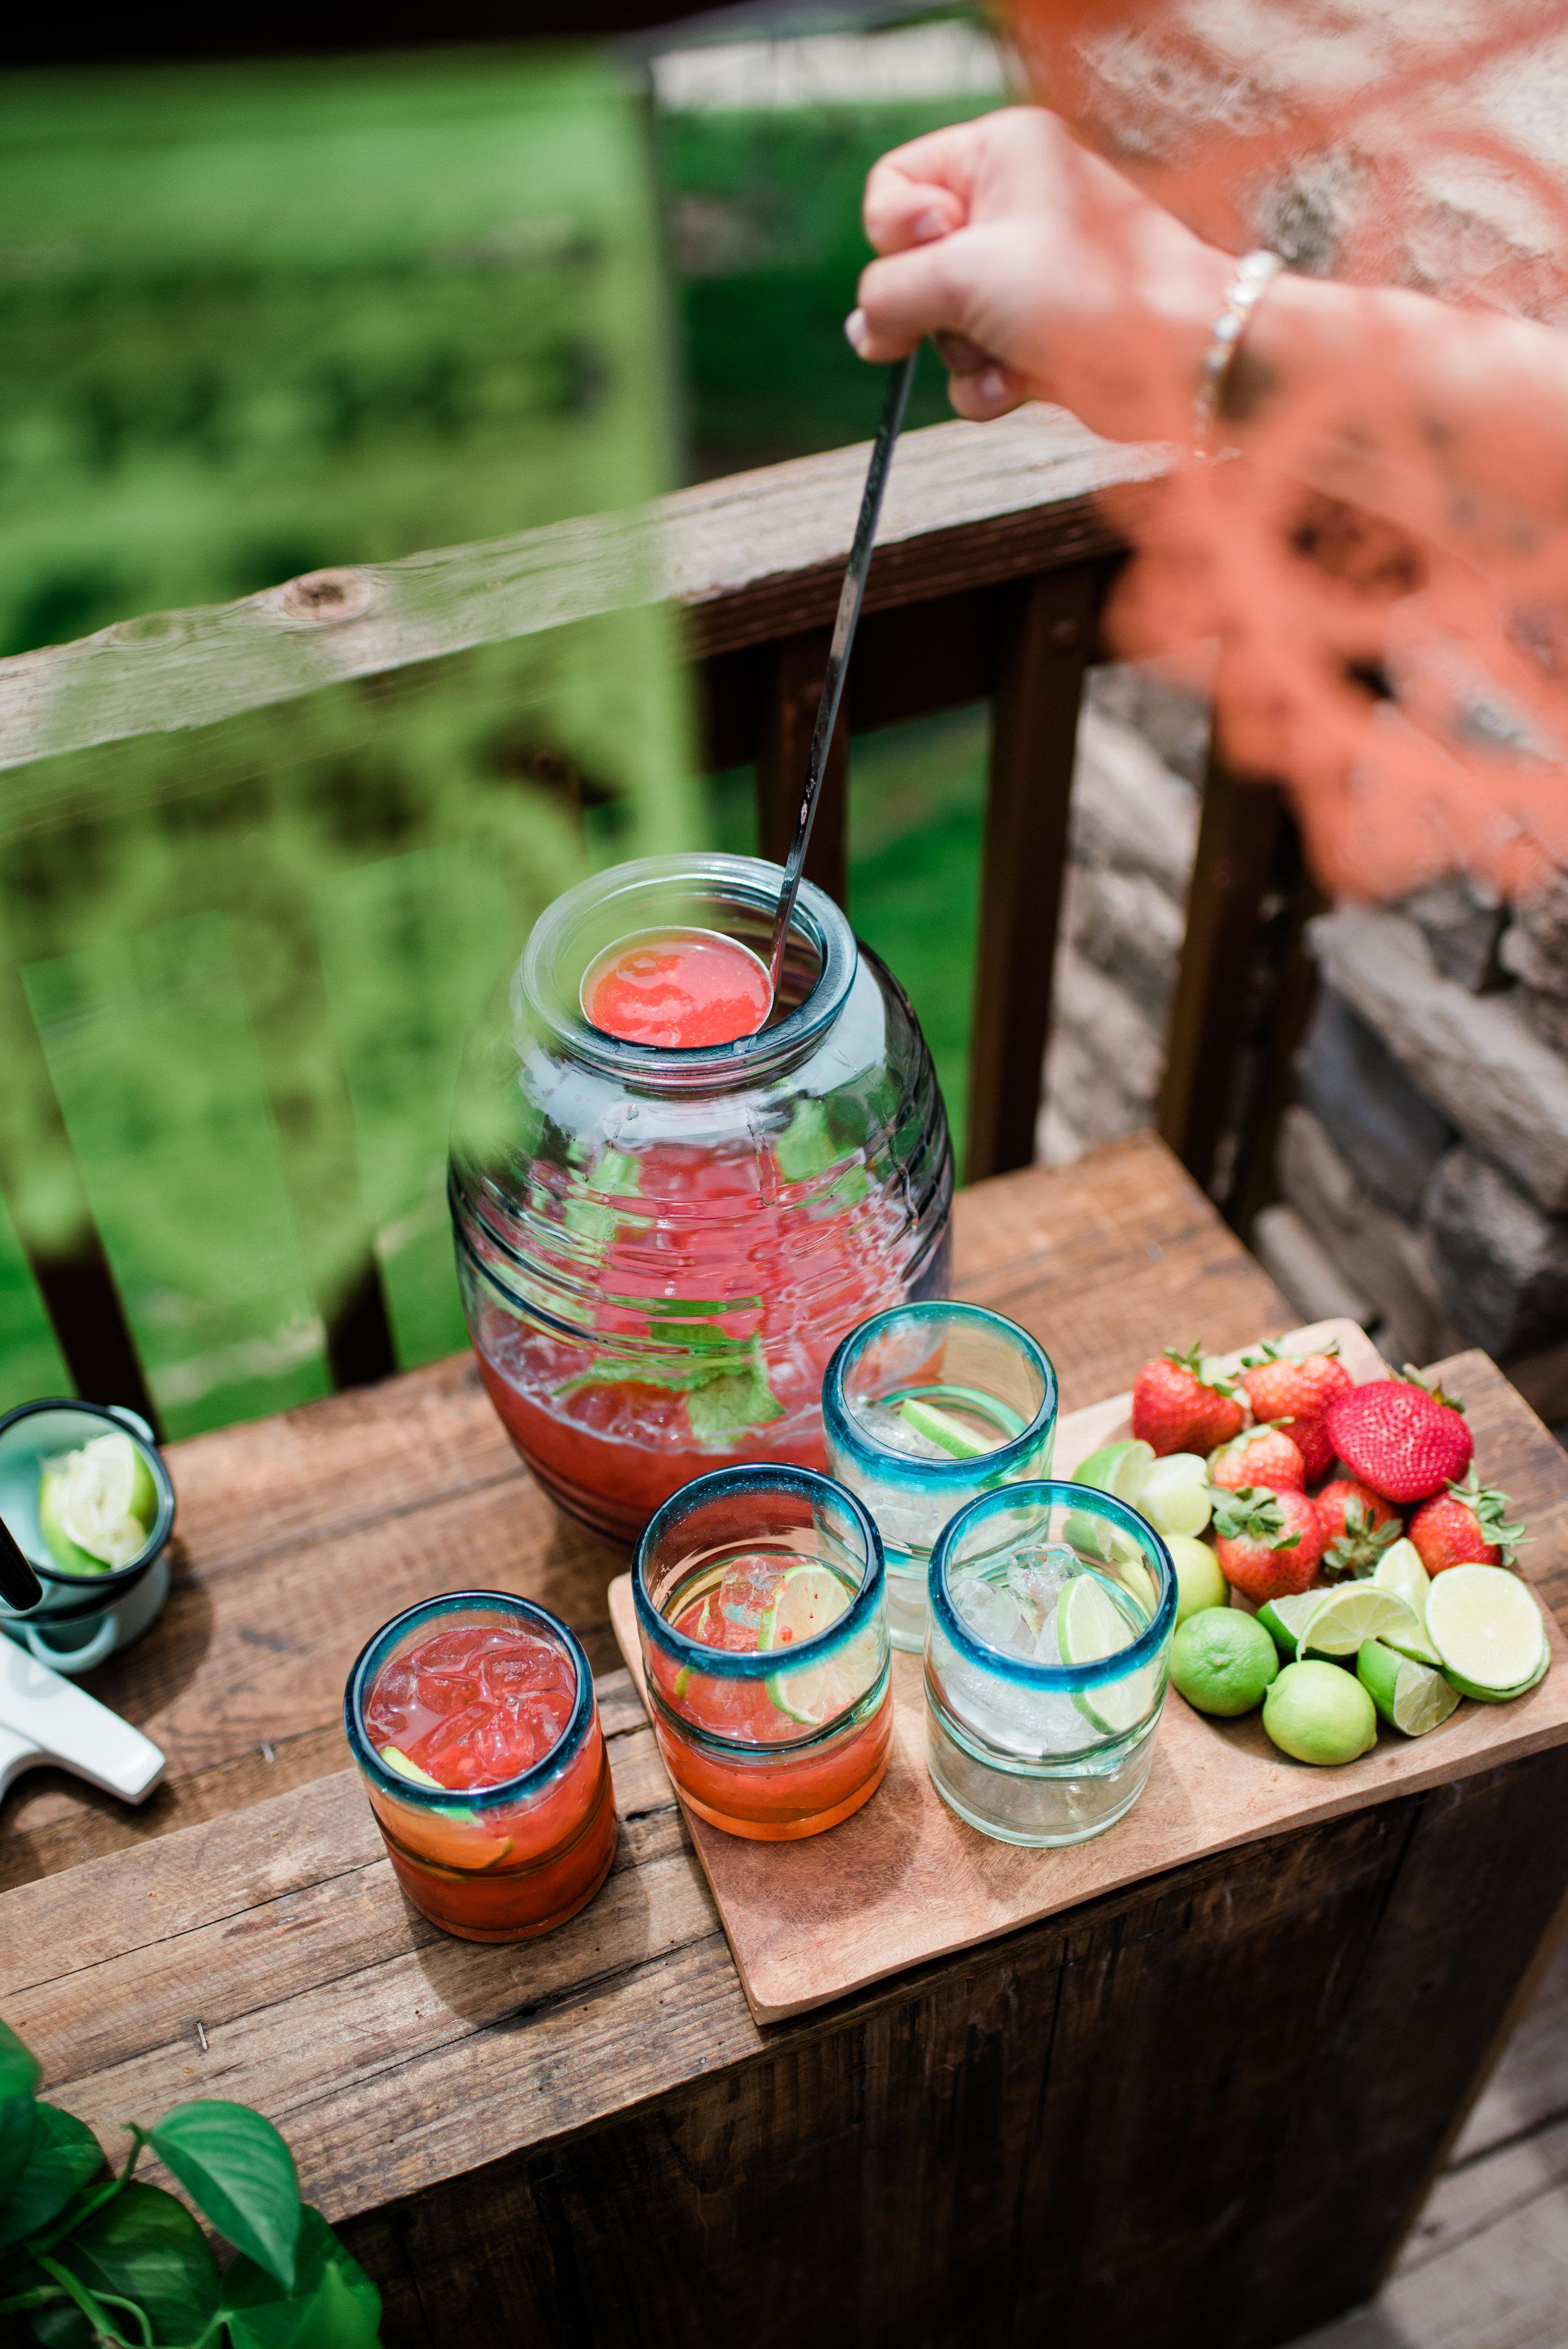 Pouring Strawberry Limonada